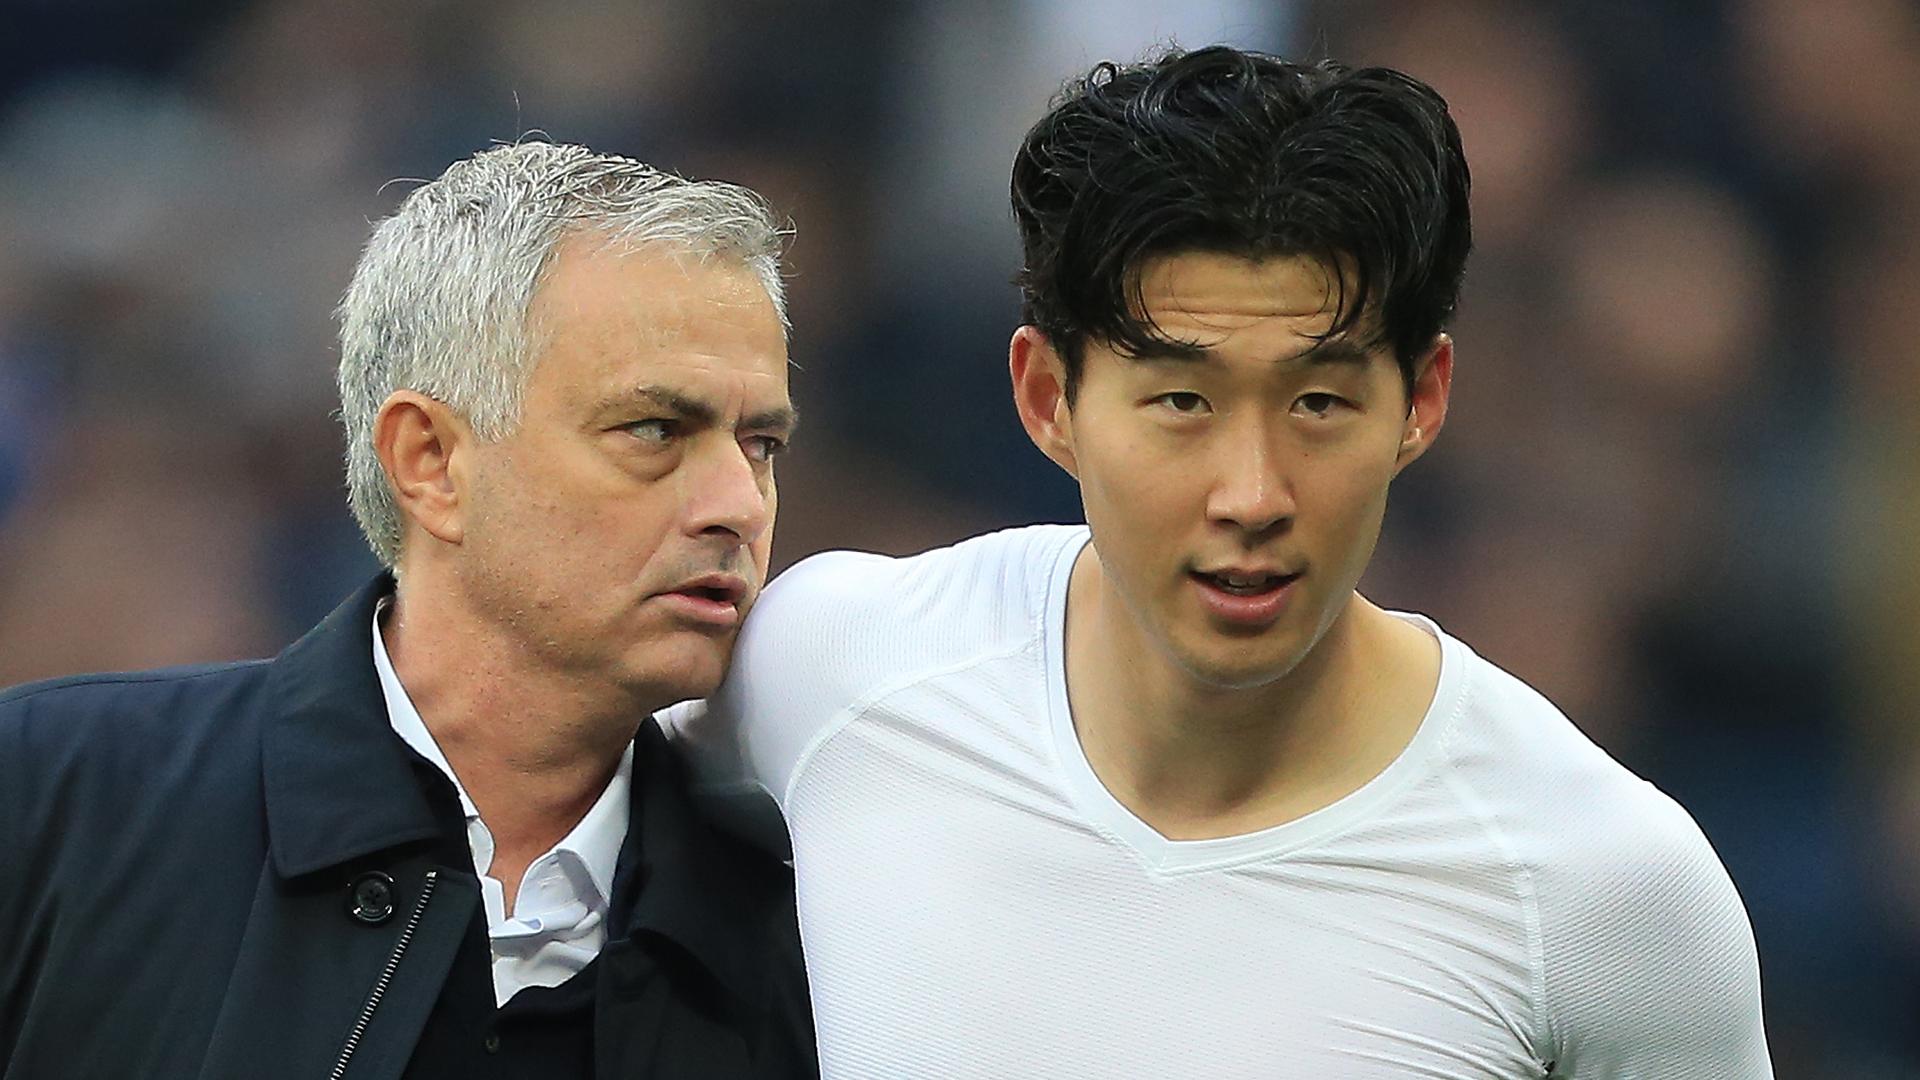 Jose-mourinho-son-tottenham_5o9jbvld8e1d19by7lsst9v9t